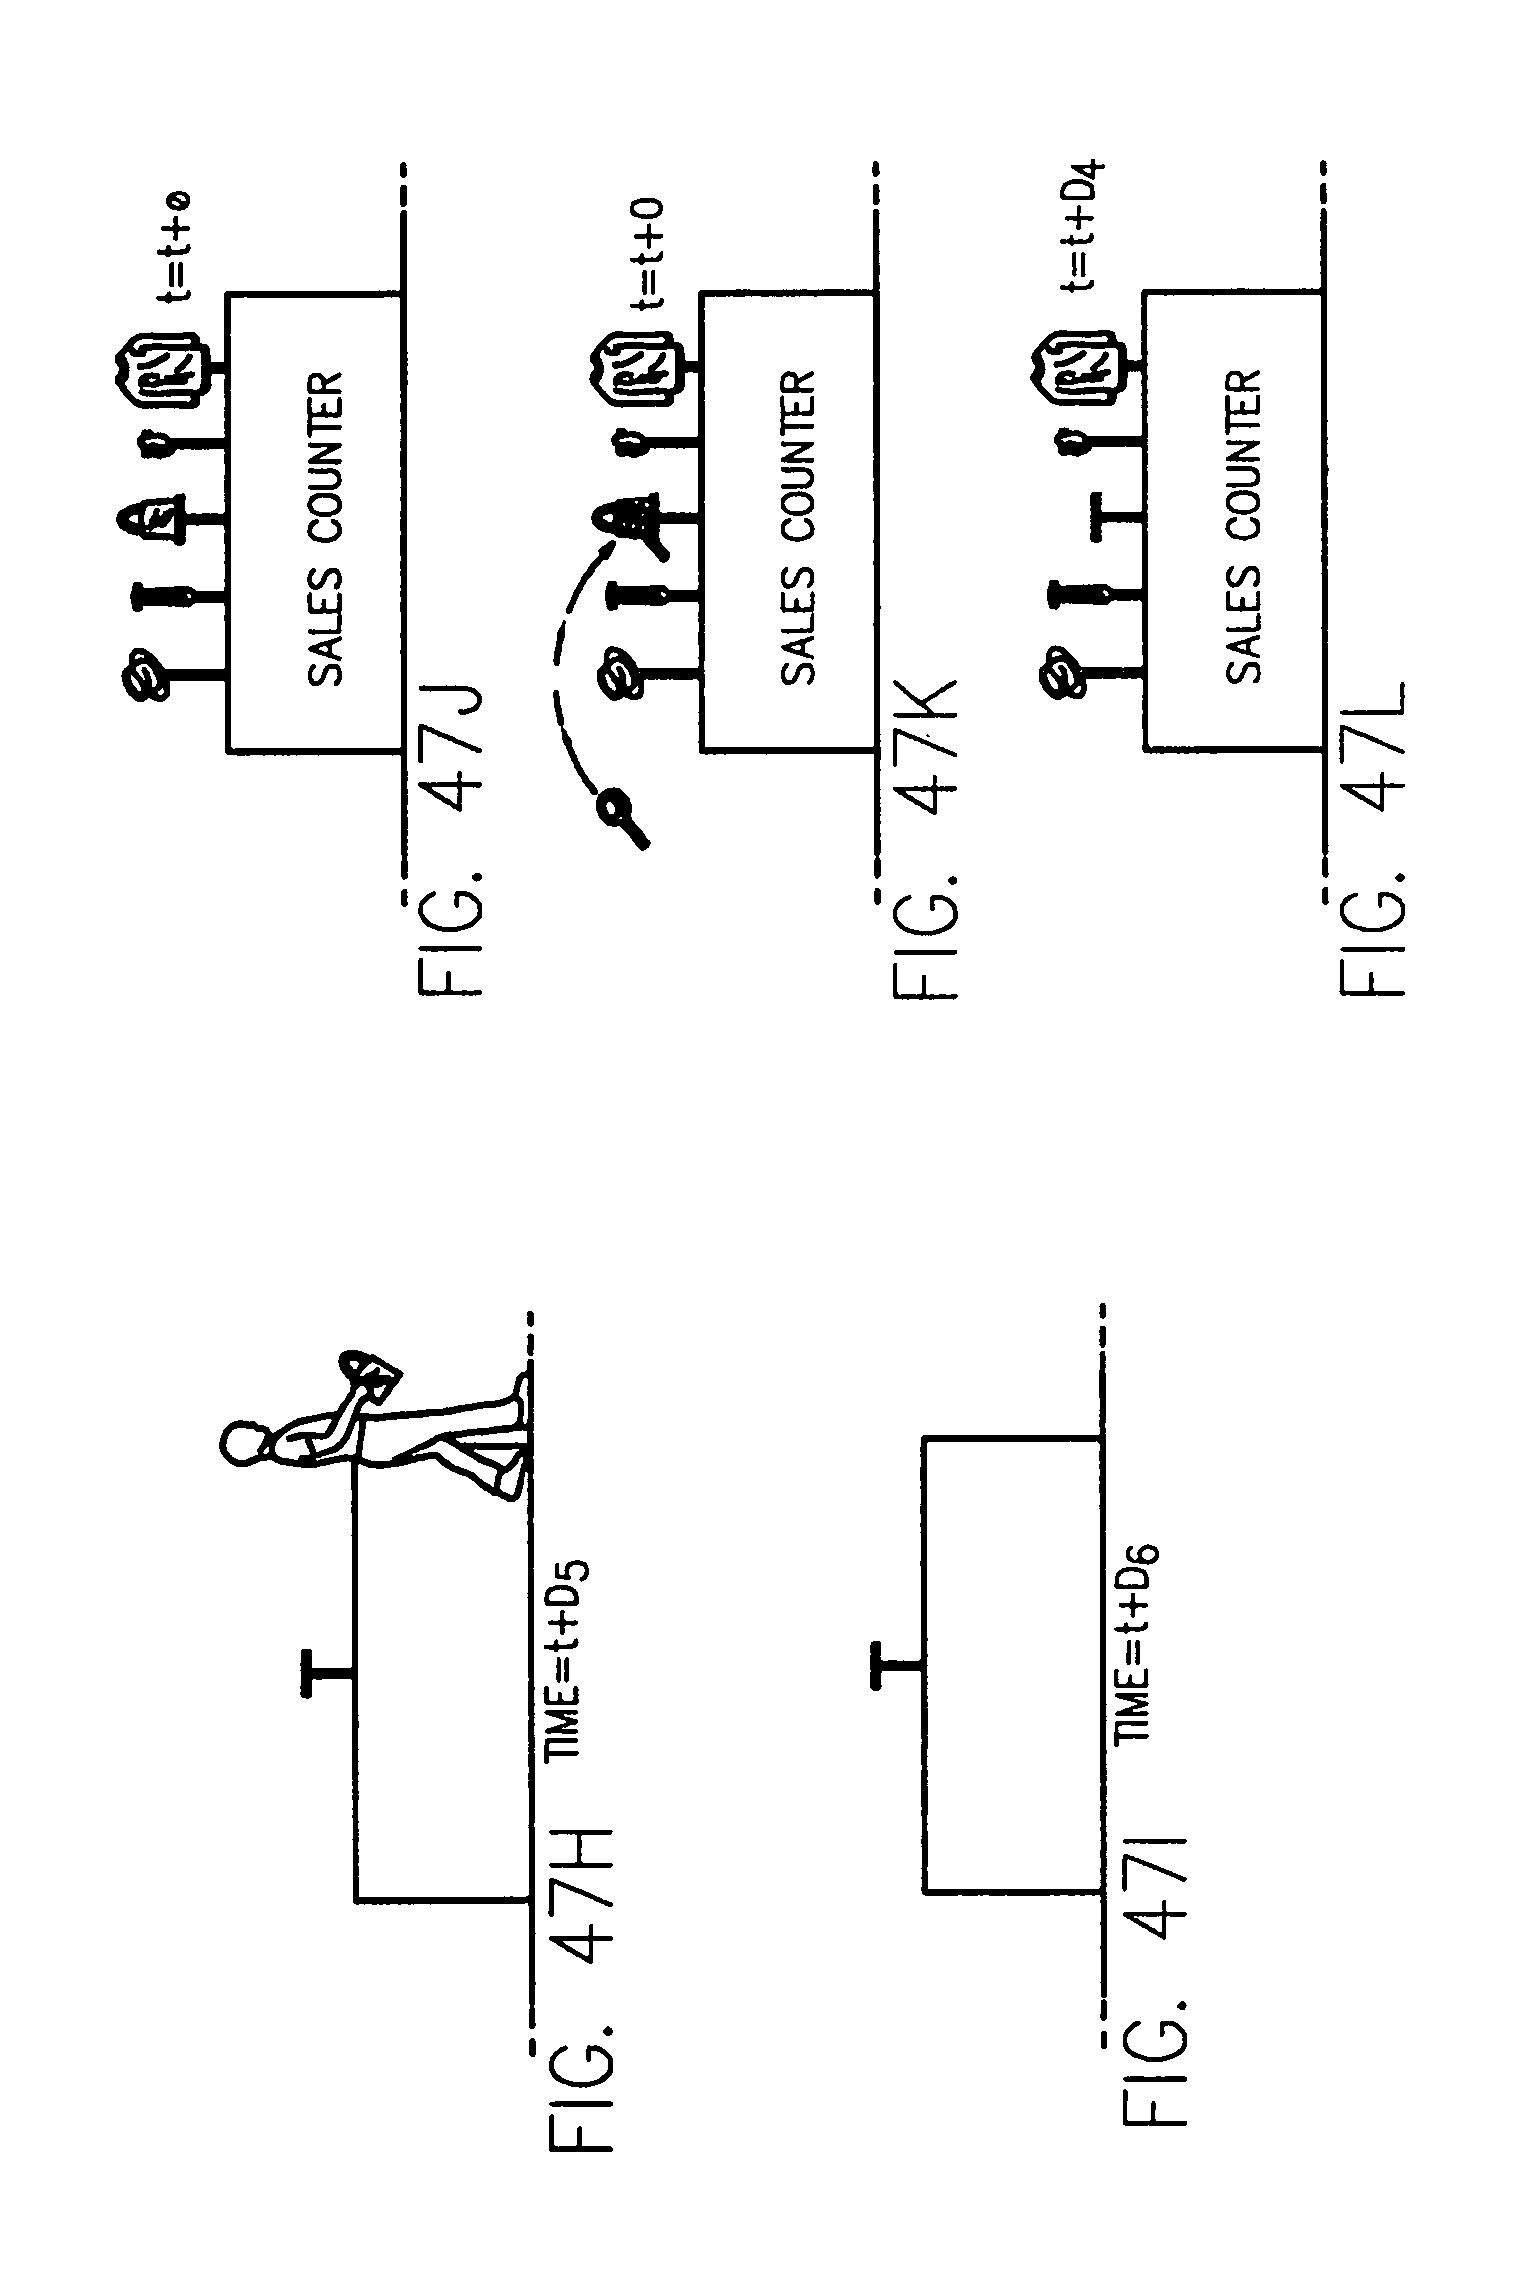 Patent Us 6970183 B1 Simple Intercom Using Tree Transistors Images